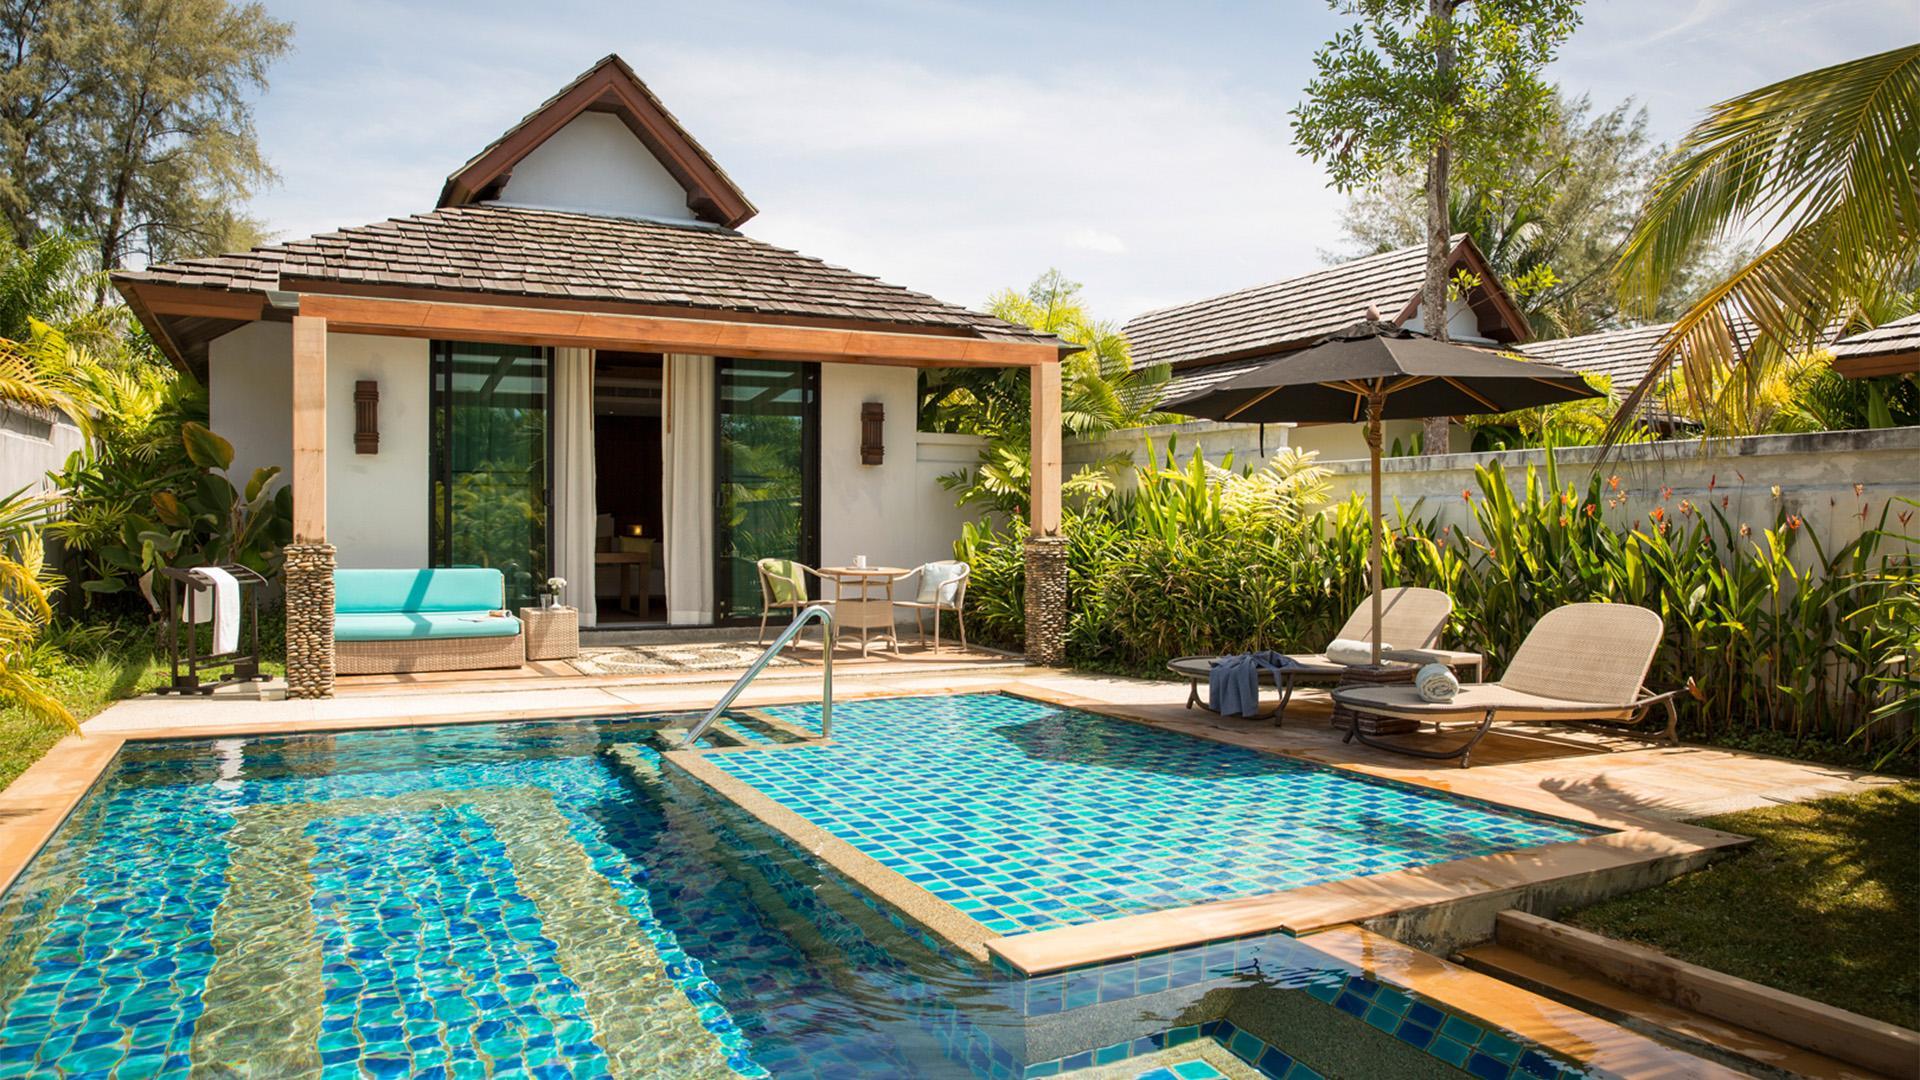 Superior Pool Bungalow image 1 at Robinson Club Khao Lak by Amphoe Takua Pa, Chang Wat Phang-nga, Thailand